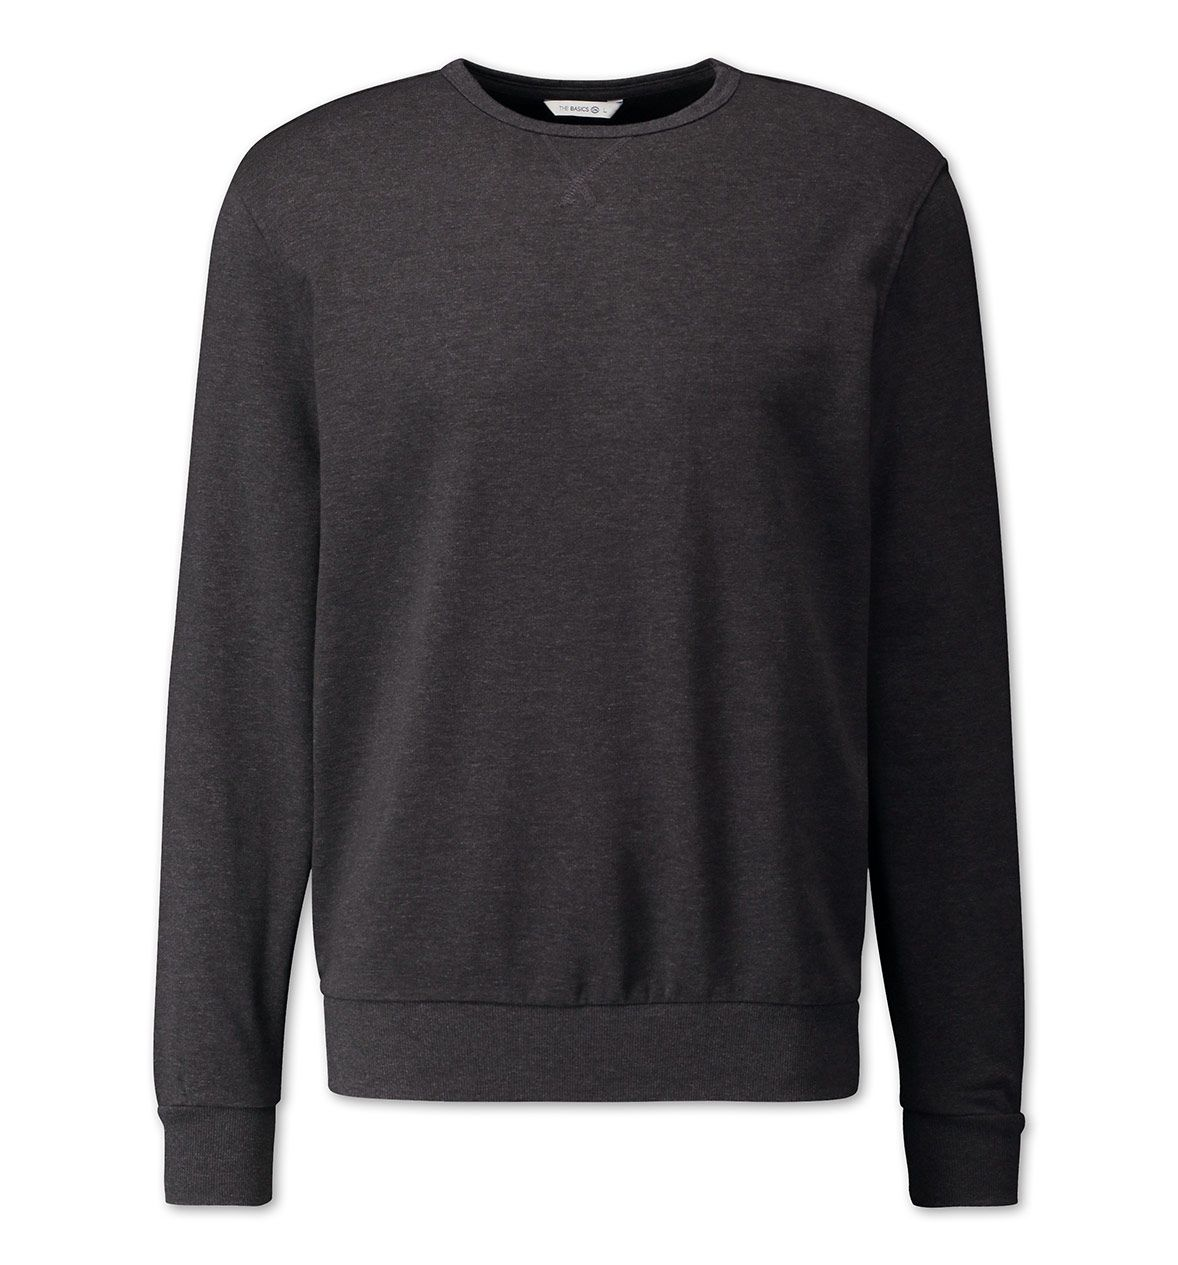 meilleur service b4f26 91b66 Sweatshirt | Wardrobe wish list | Boutique en ligne, Veste a ...